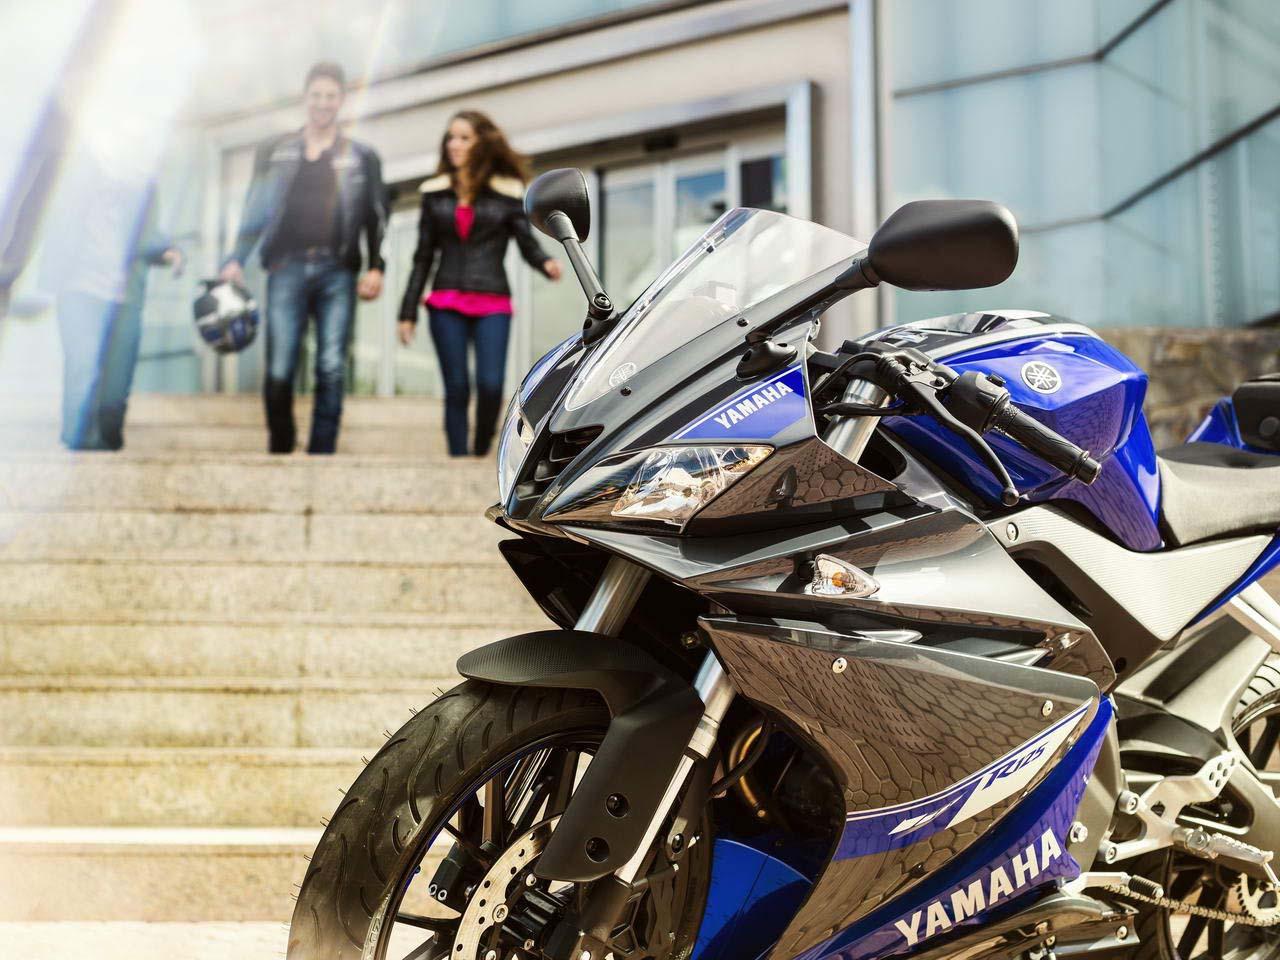 Yamaha R15 Seat Height Adjustment